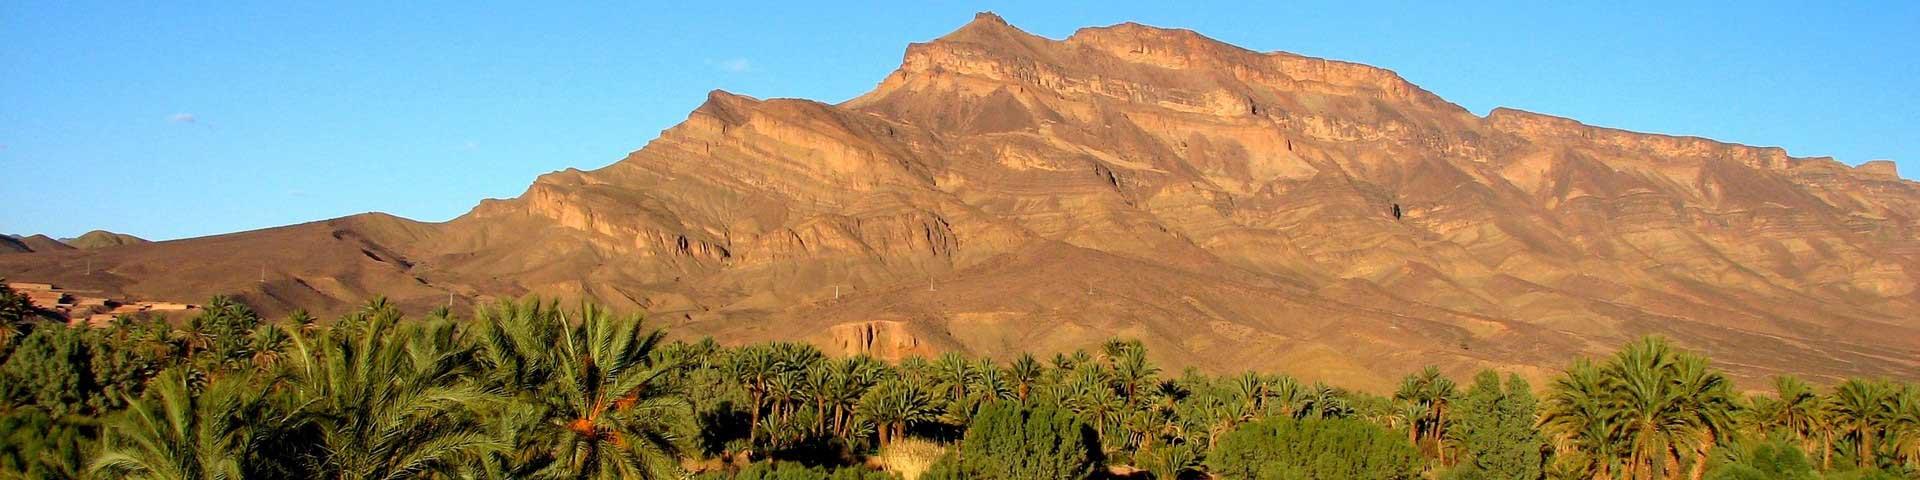 Moroccan Rift